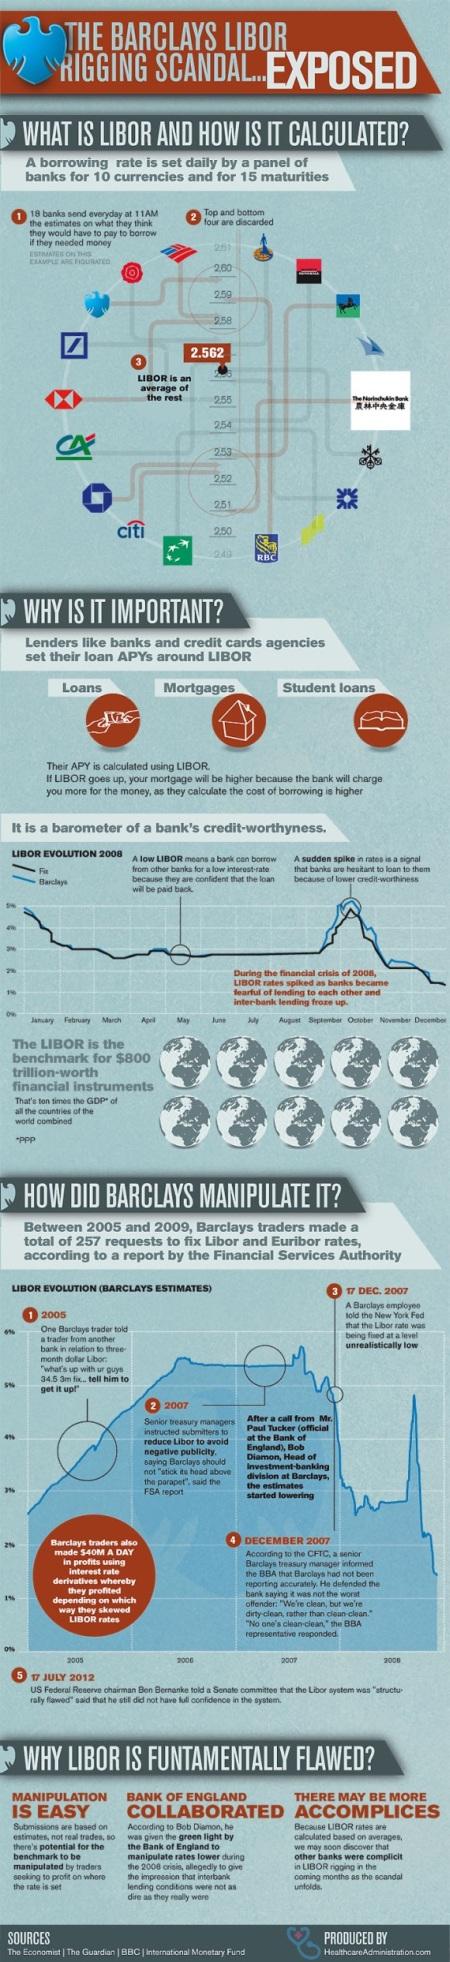 Exposing Barclays LIBOR Rigging Scandal